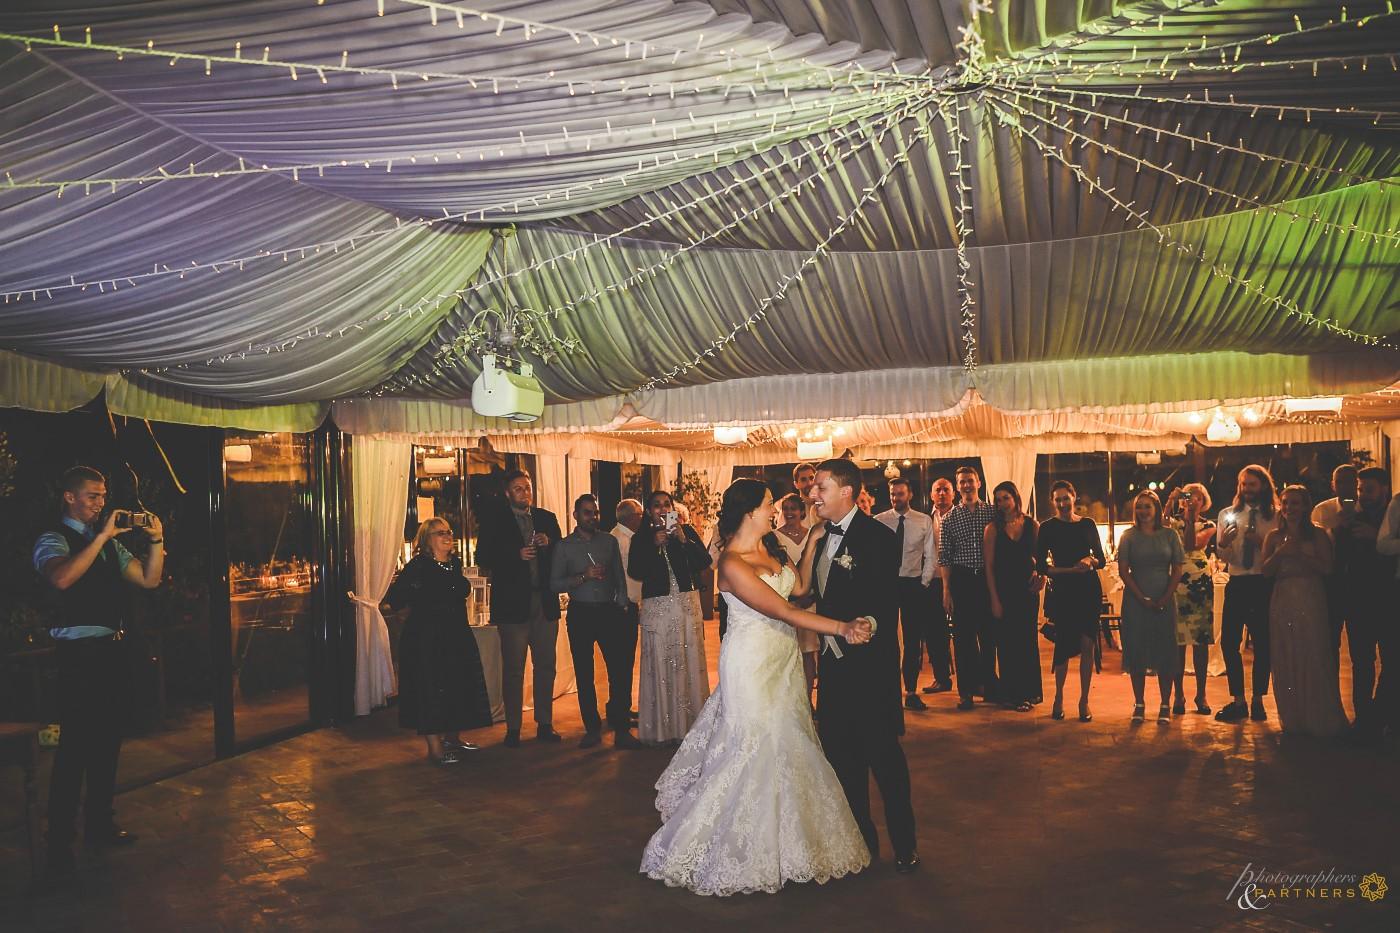 wedding_photography_villa_baroncino_21.jpg